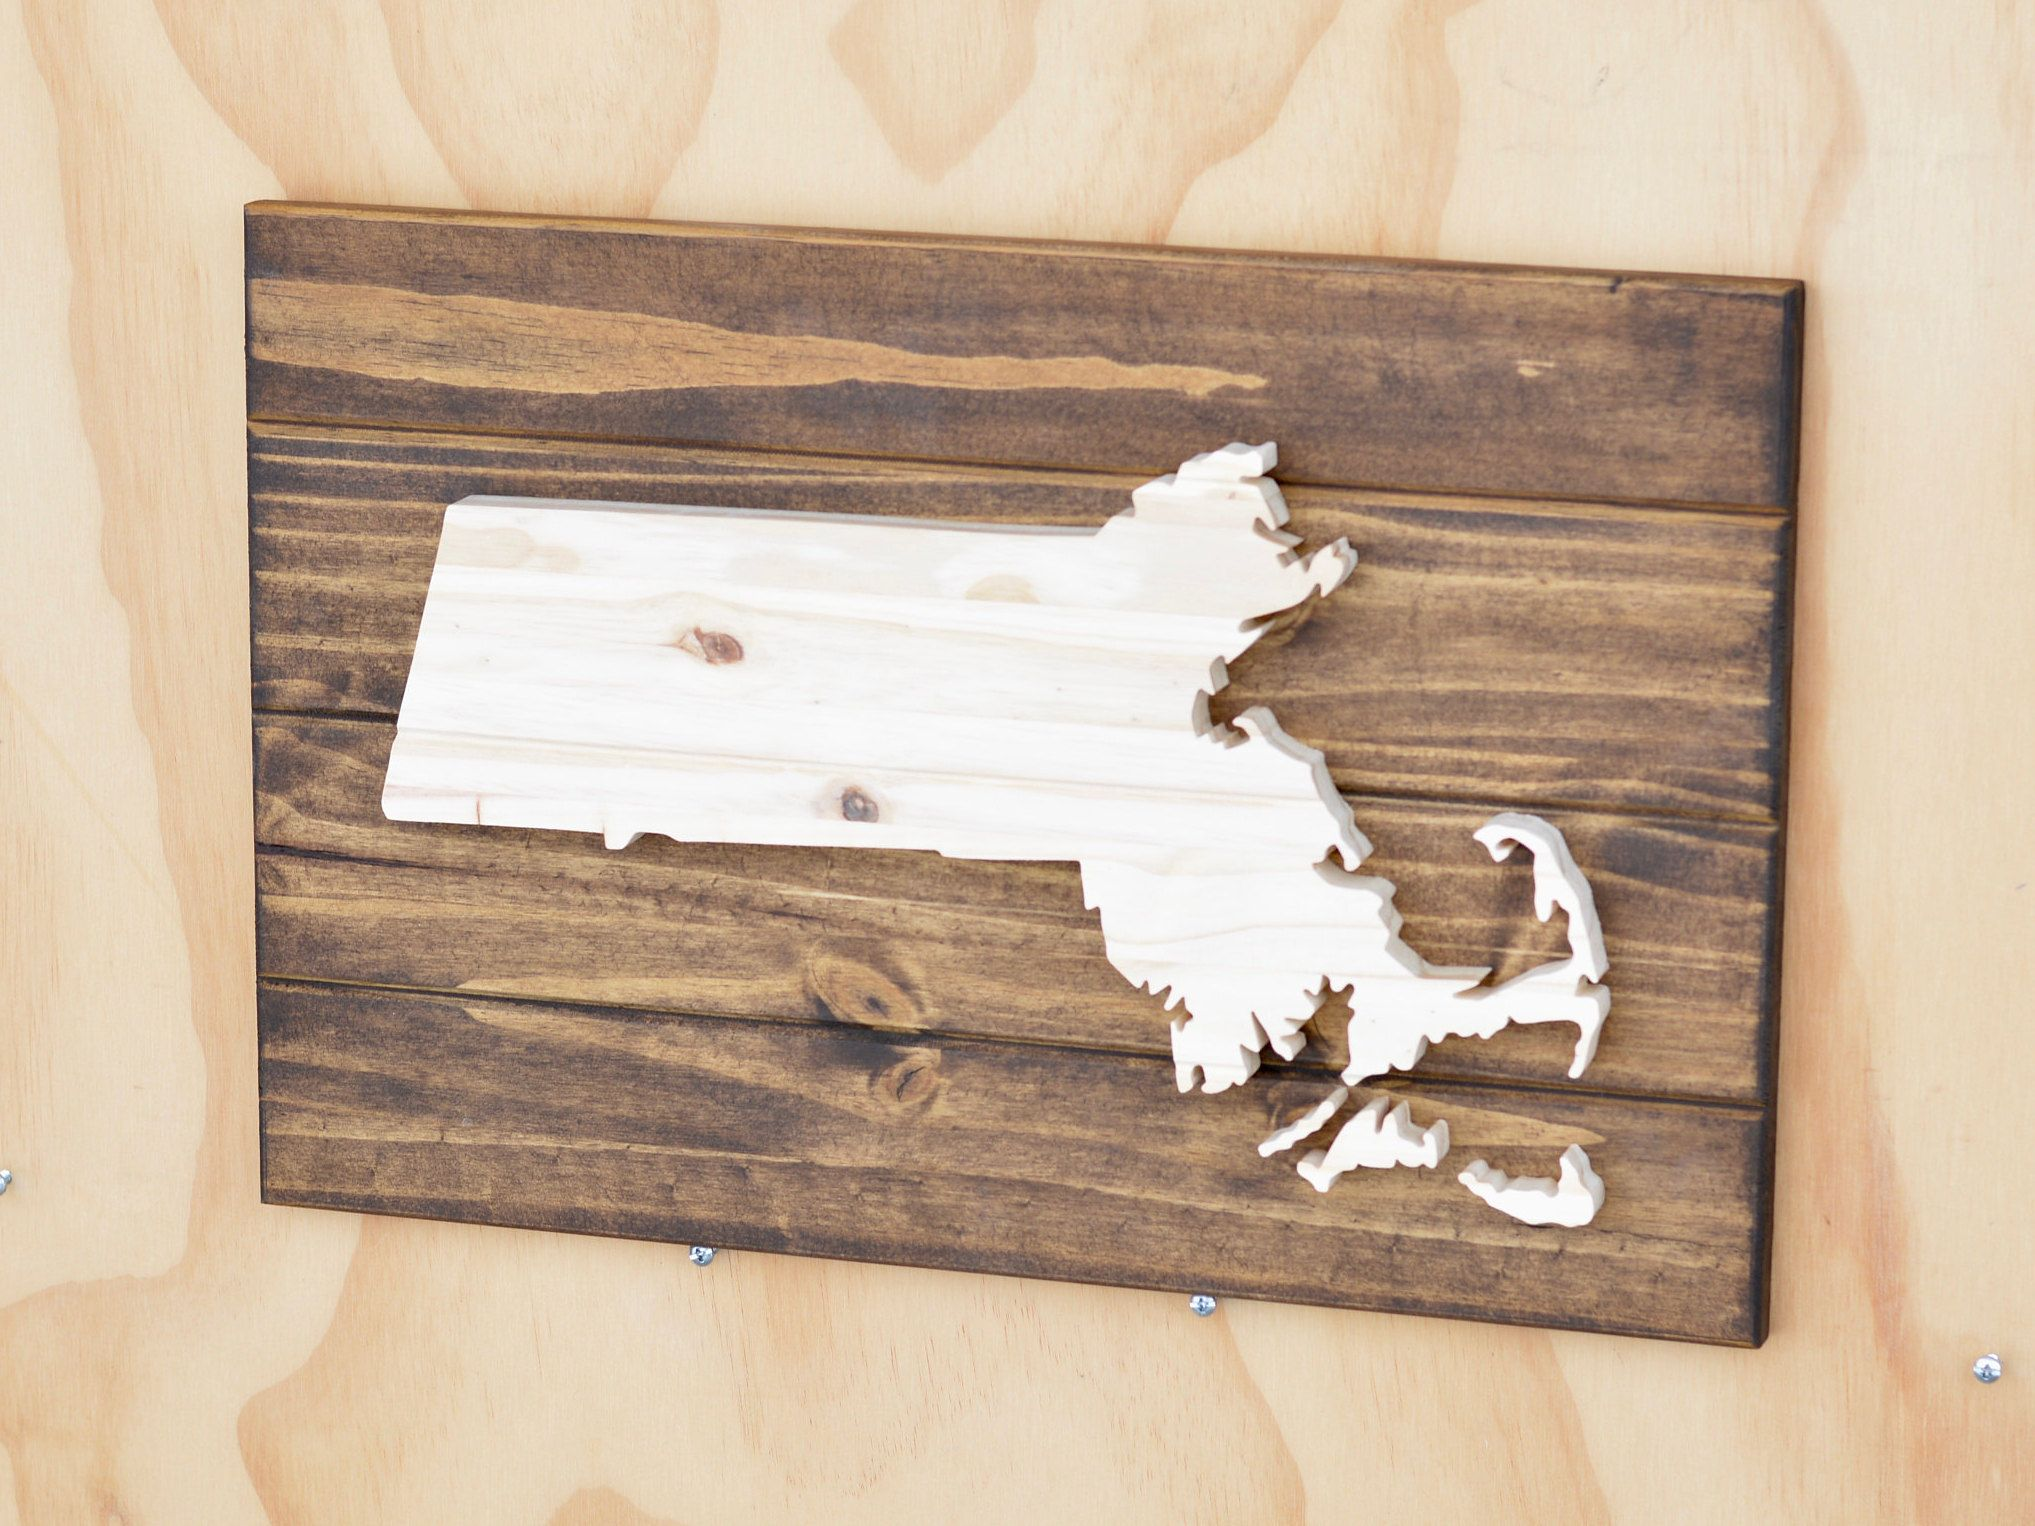 Massachusetts State Wood Plaque Cutout Wooden Cutouts Wood Plaques Wood Cutouts